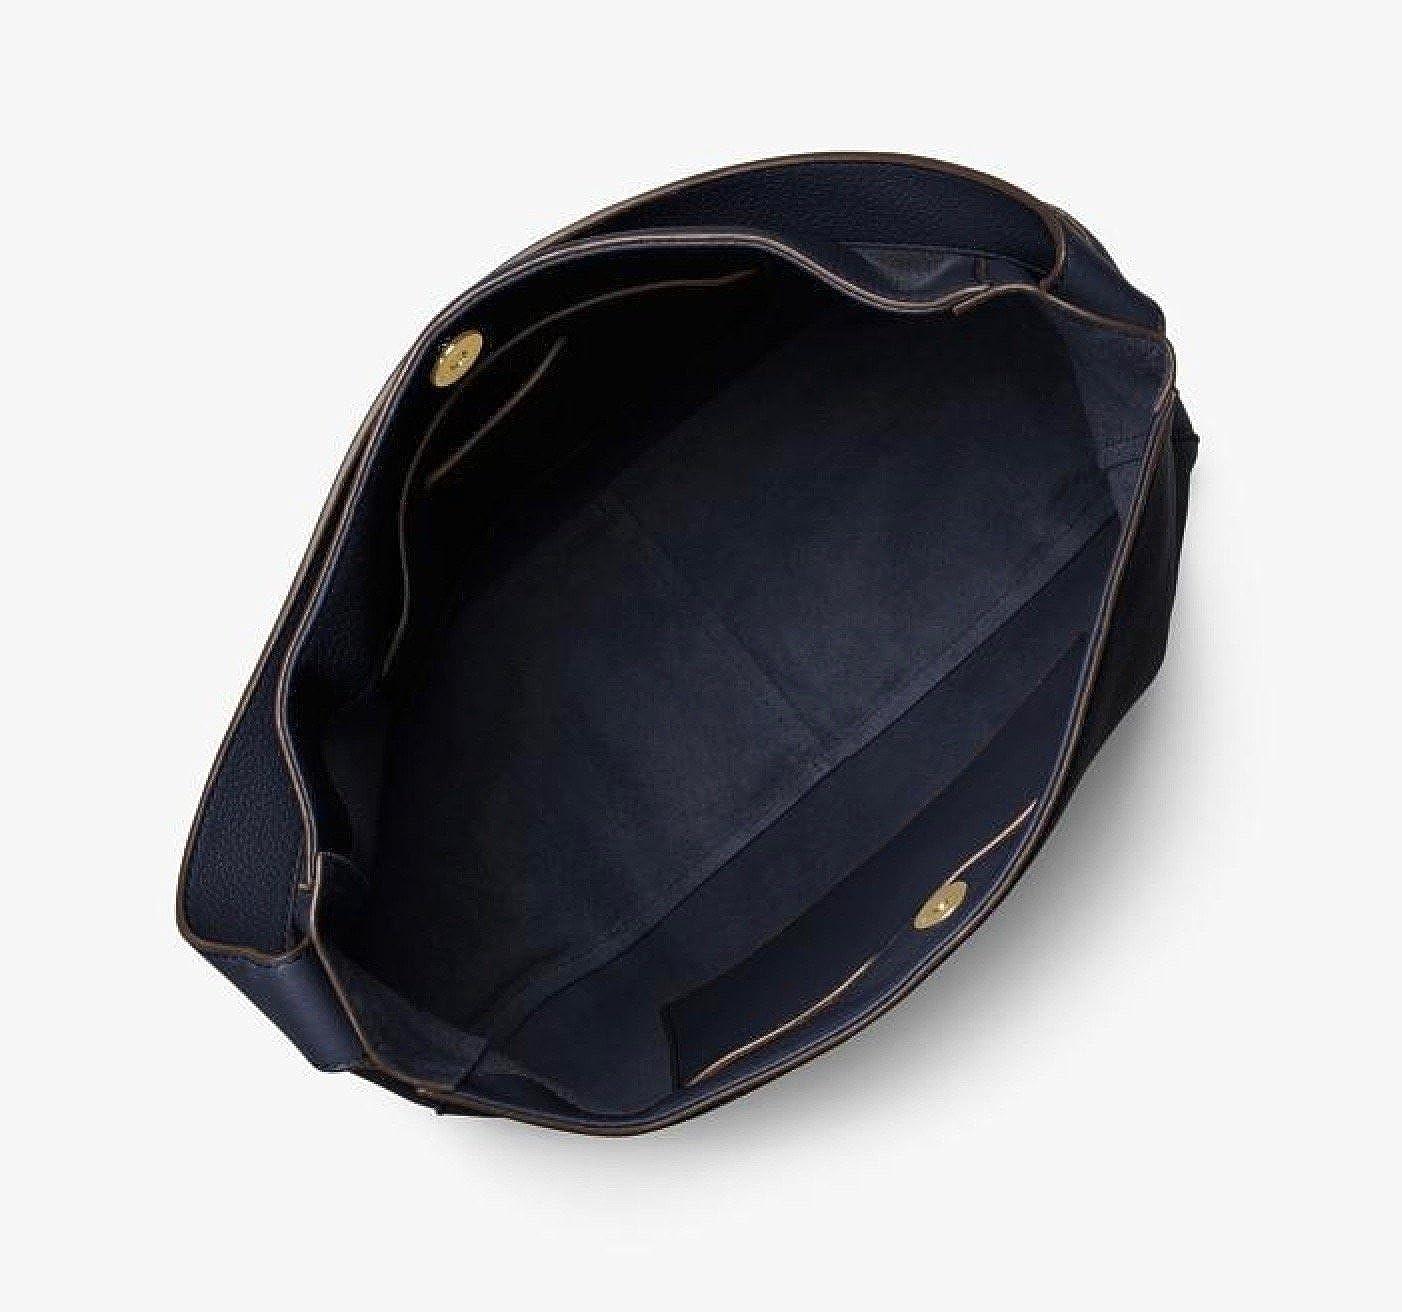 fc8b2df9de85 MICHAEL MICHAEL KORS Ashbury Large Leather Shoulder Bag  Handbags   Amazon.com